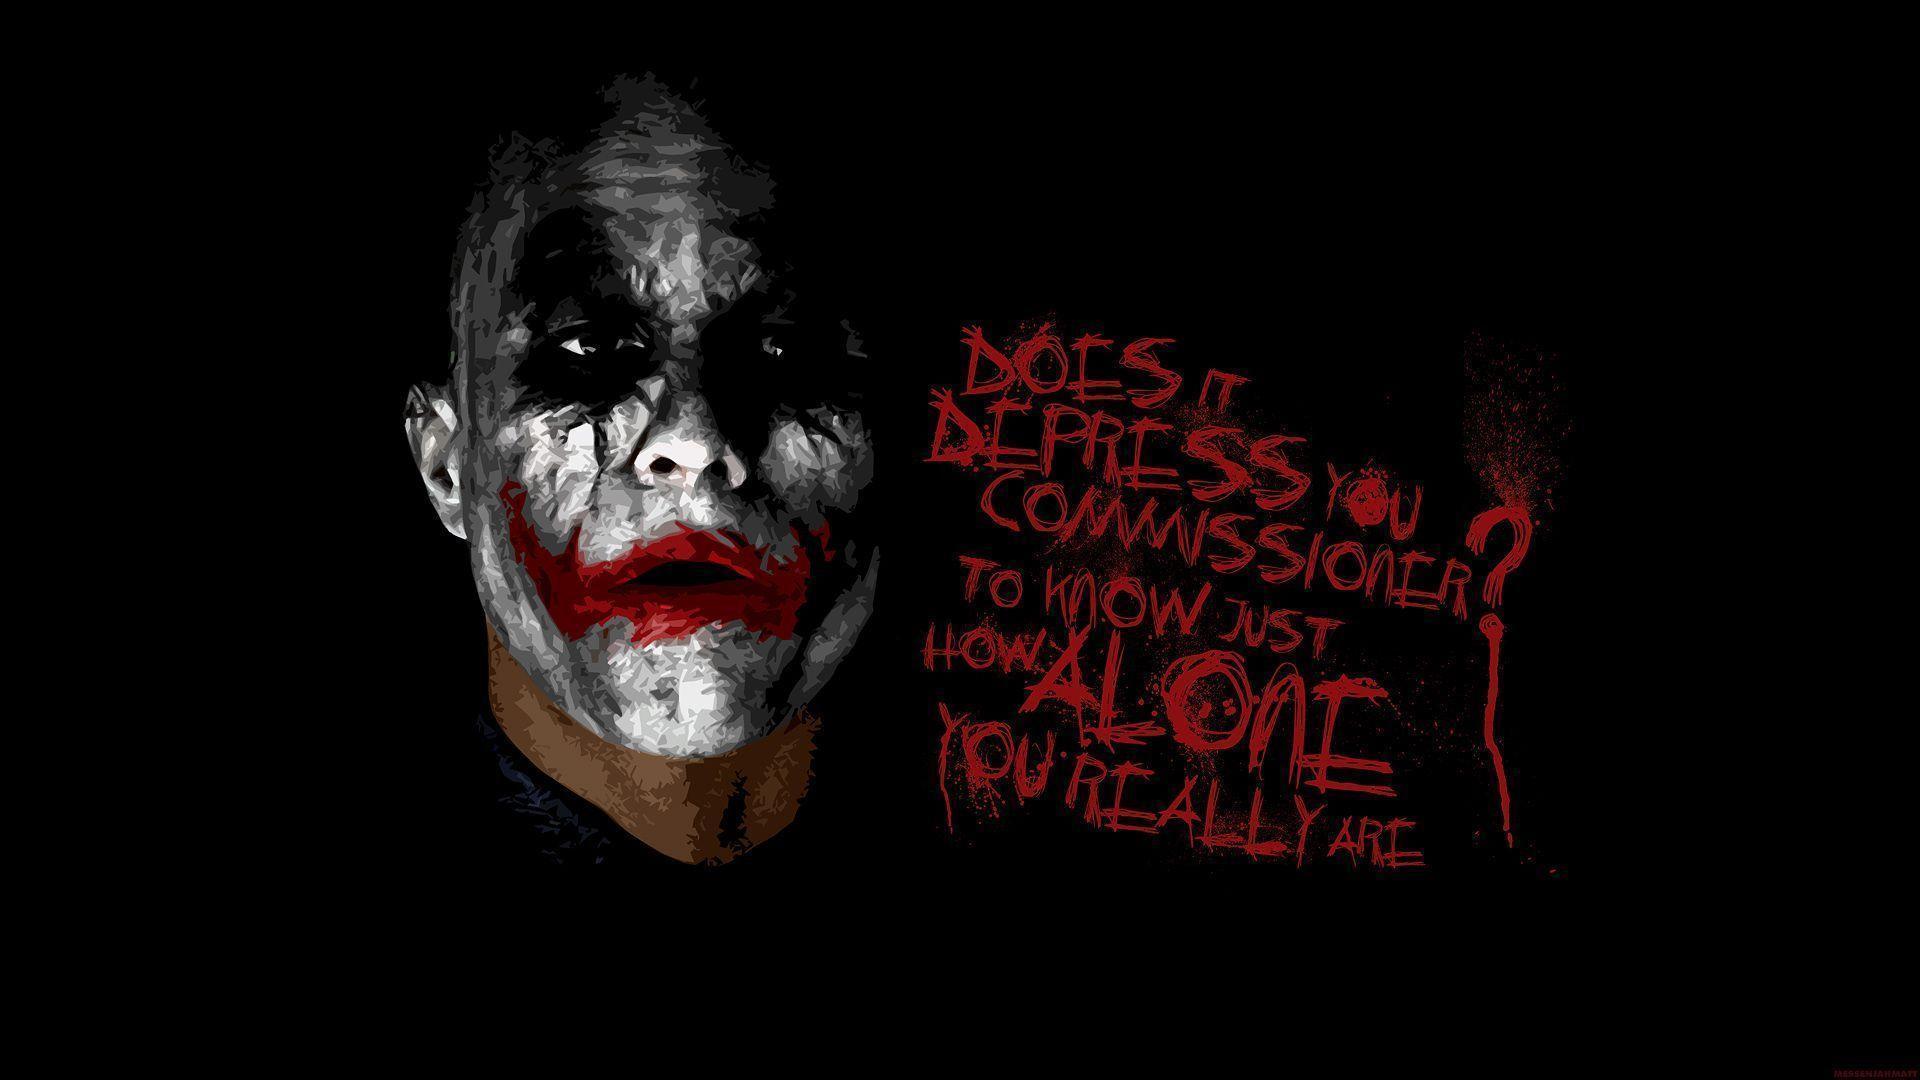 joker wallpaper pc - photo #30